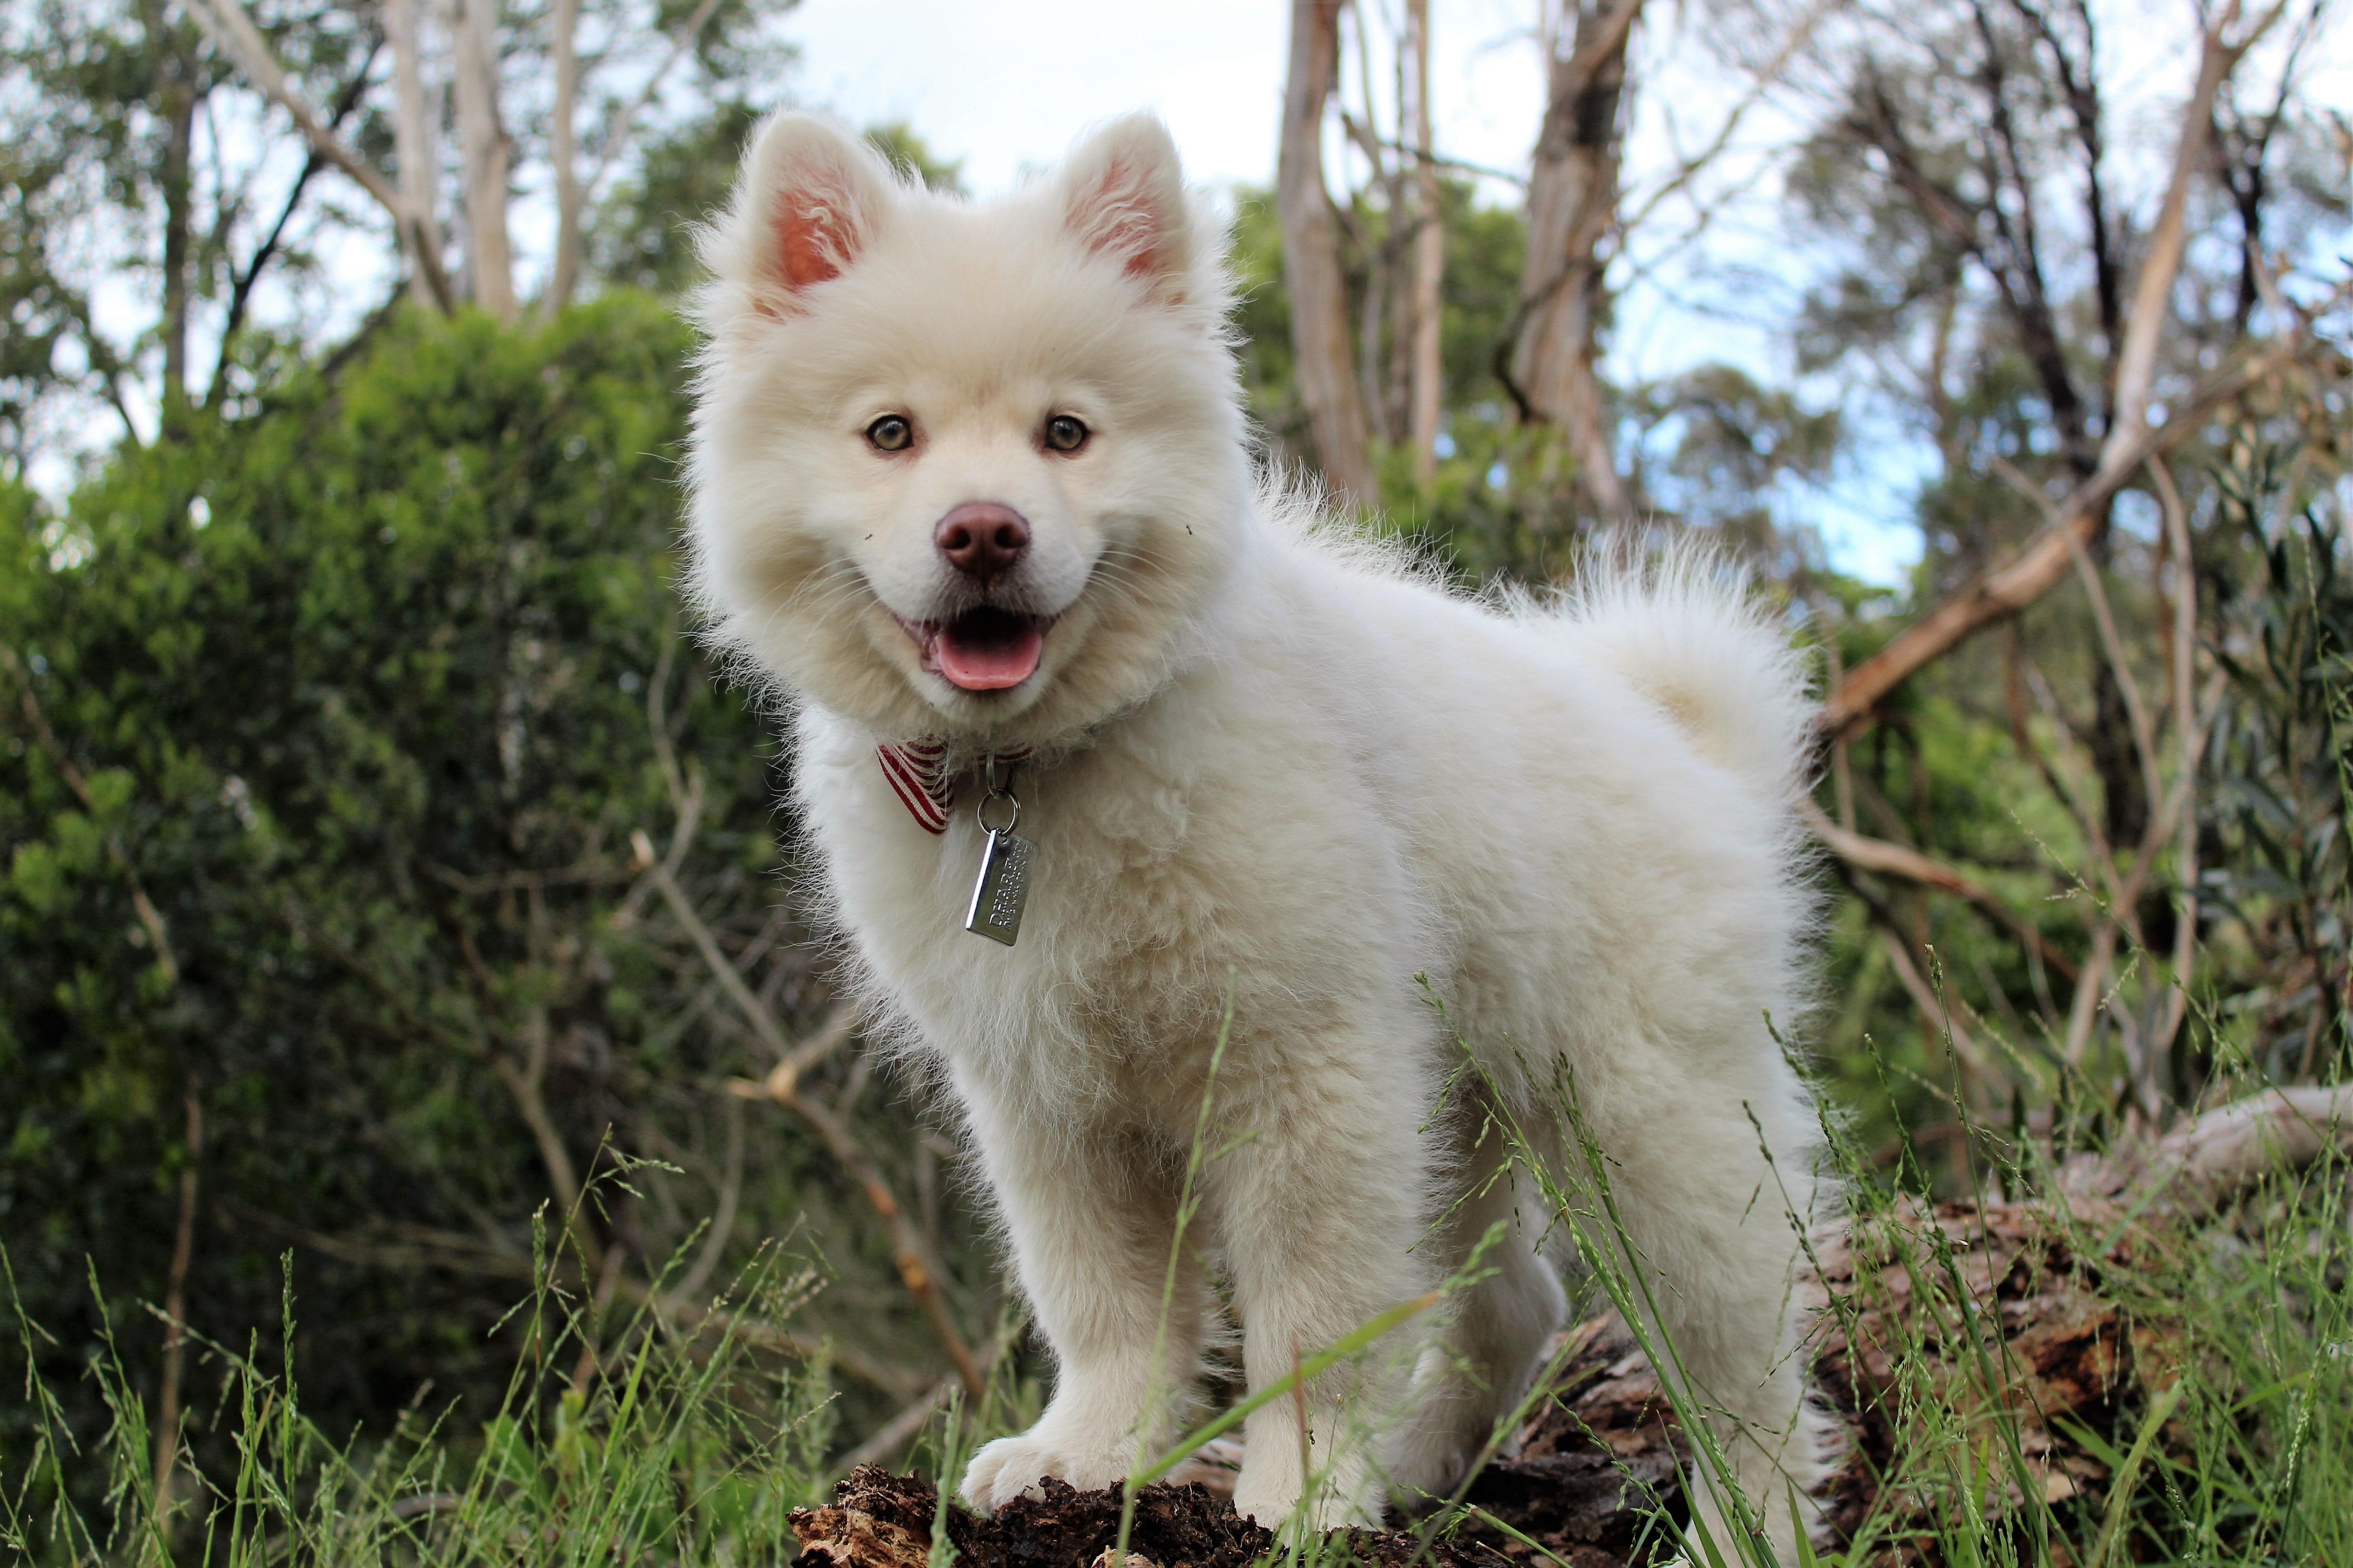 Fantastic Icelandic Sheepdog Canine Adorable Dog - white-play-puppy-dog-animal-cute-canine-summer-love-pet-portrait-young-mammal-friendship-smile-friend-nose-fun-happy-happiness-relationship-ears-head-little-vertebrate-dog-breed-friendly-breed-pomeranian-samoyed-happy-dog-akita-inu-dog-like-mammal-carnivoran-dog-breed-group-greenland-dog-east-siberian-laika-west-siberian-laika-icelandic-sheepdog-german-spitz-mittel-japanese-spitz-american-eskimo-dog-german-spitz-german-spitz-klein-volpino-italiano-kishu-norwegian-buhund-1173206  Photograph_508075  .jpg